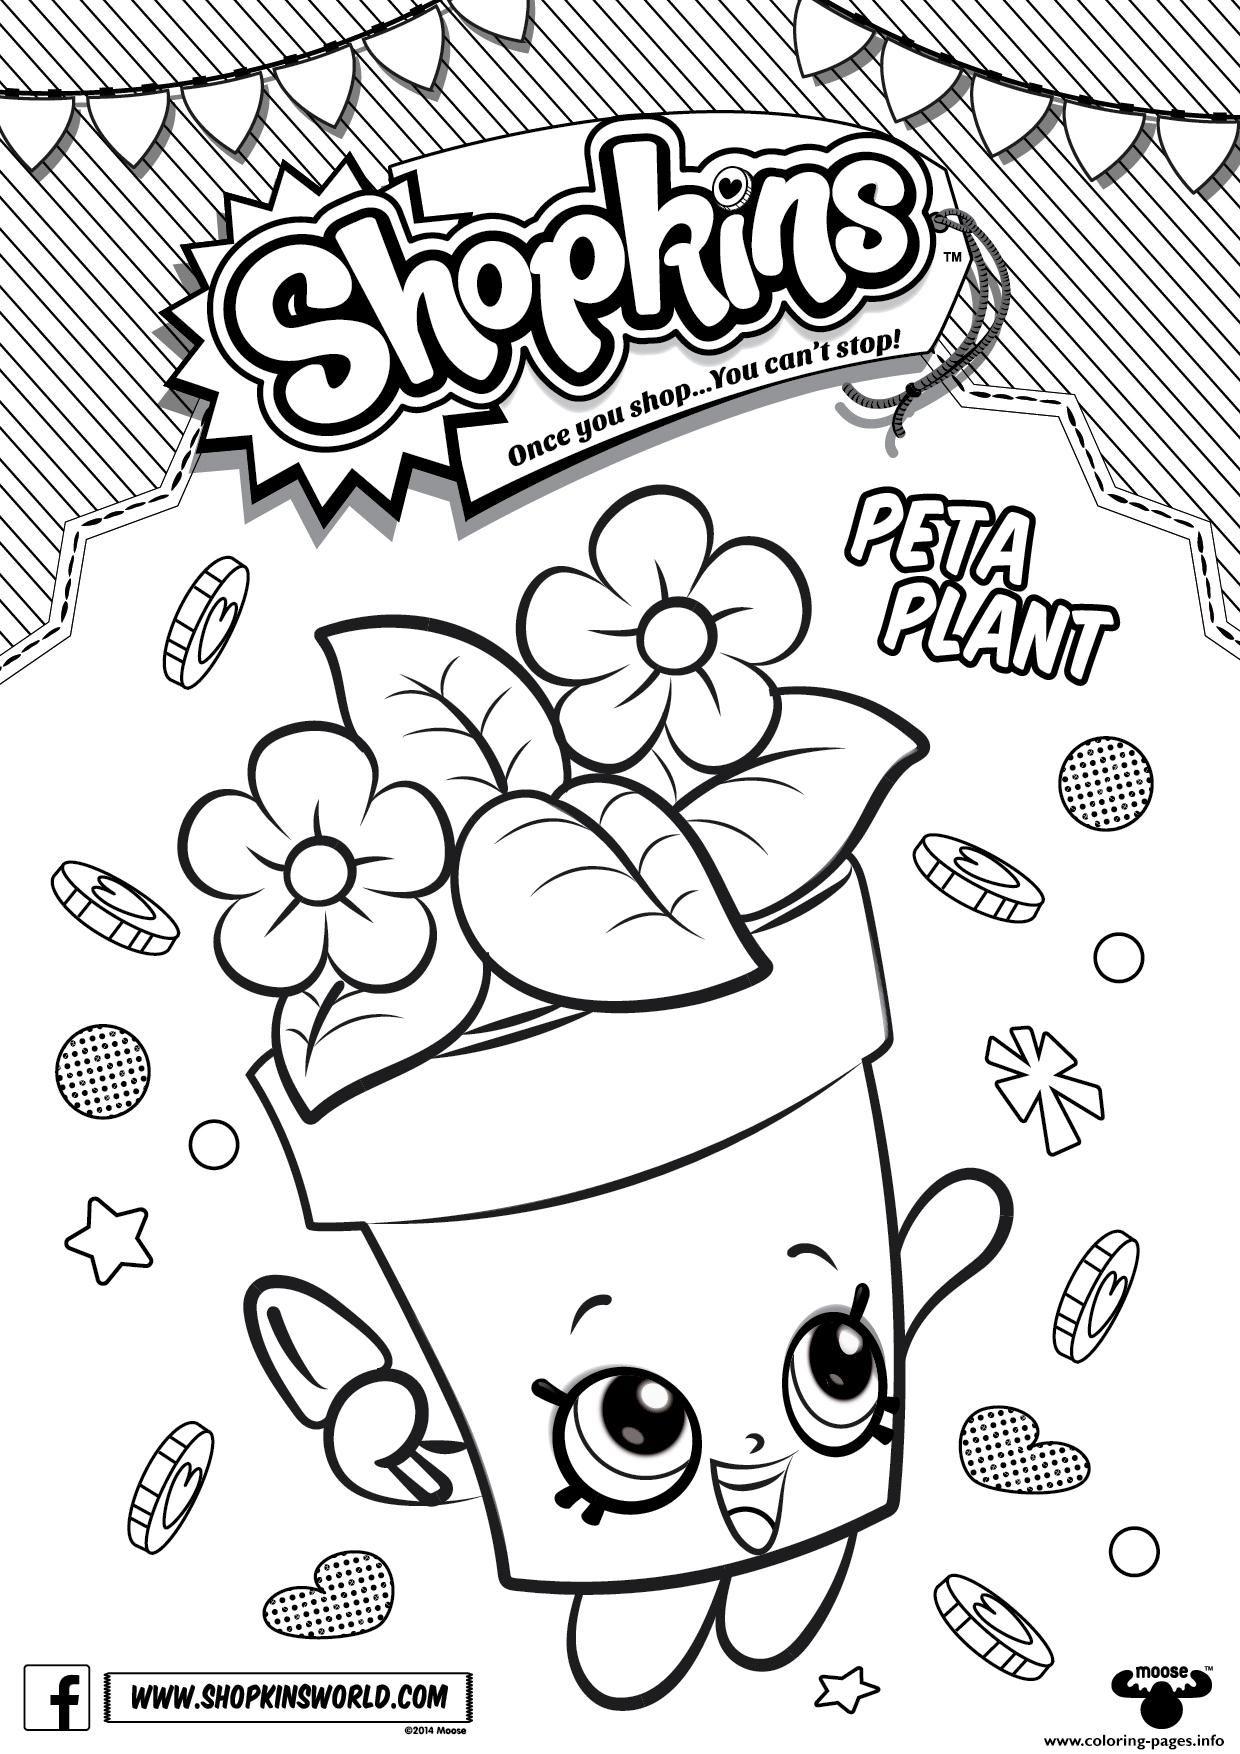 Print Shopkins Peta Plant Coloring Pages Printables Shopkins